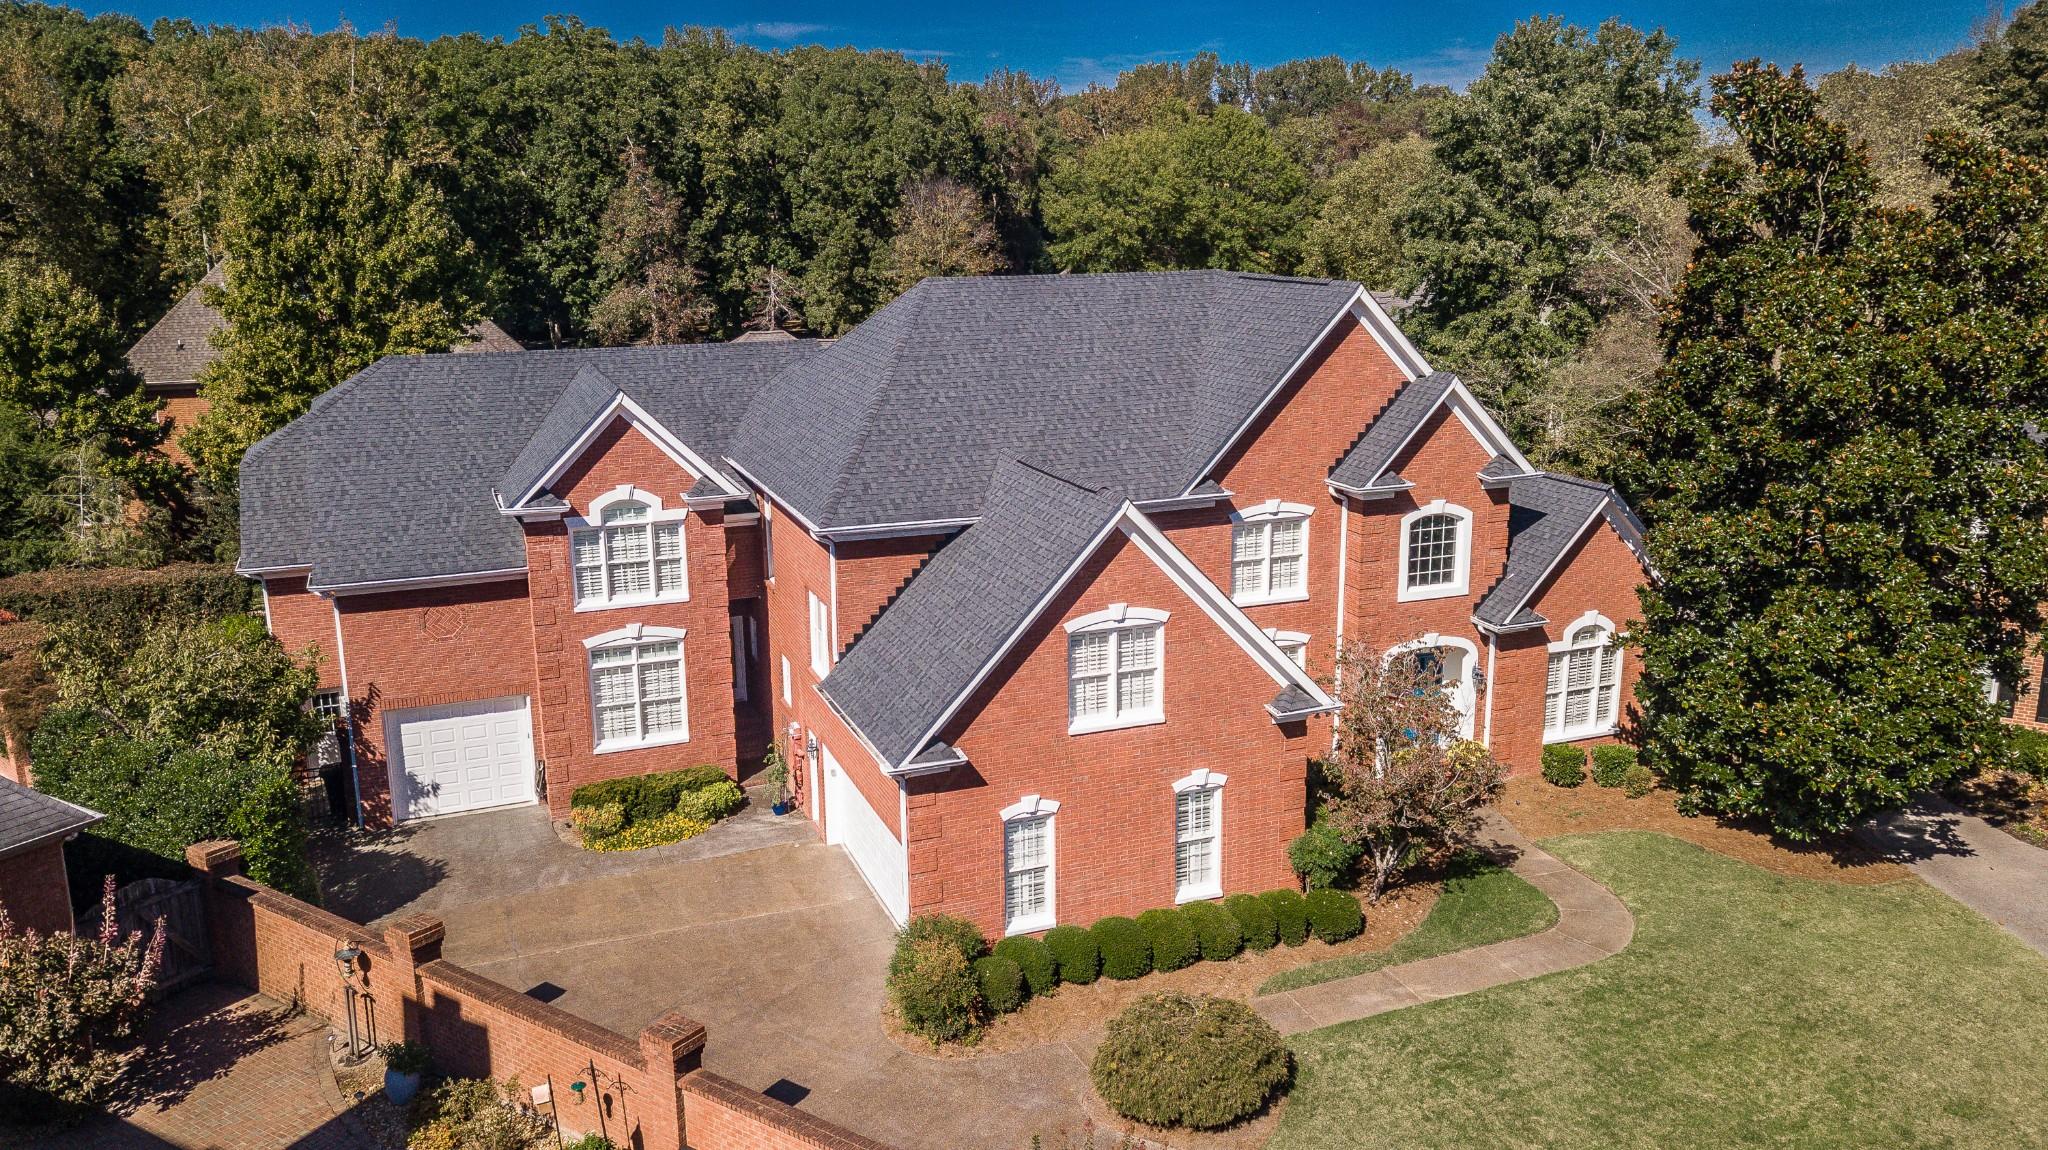 98 Hidden Way Ct, Hendersonville, TN 37075 - Hendersonville, TN real estate listing